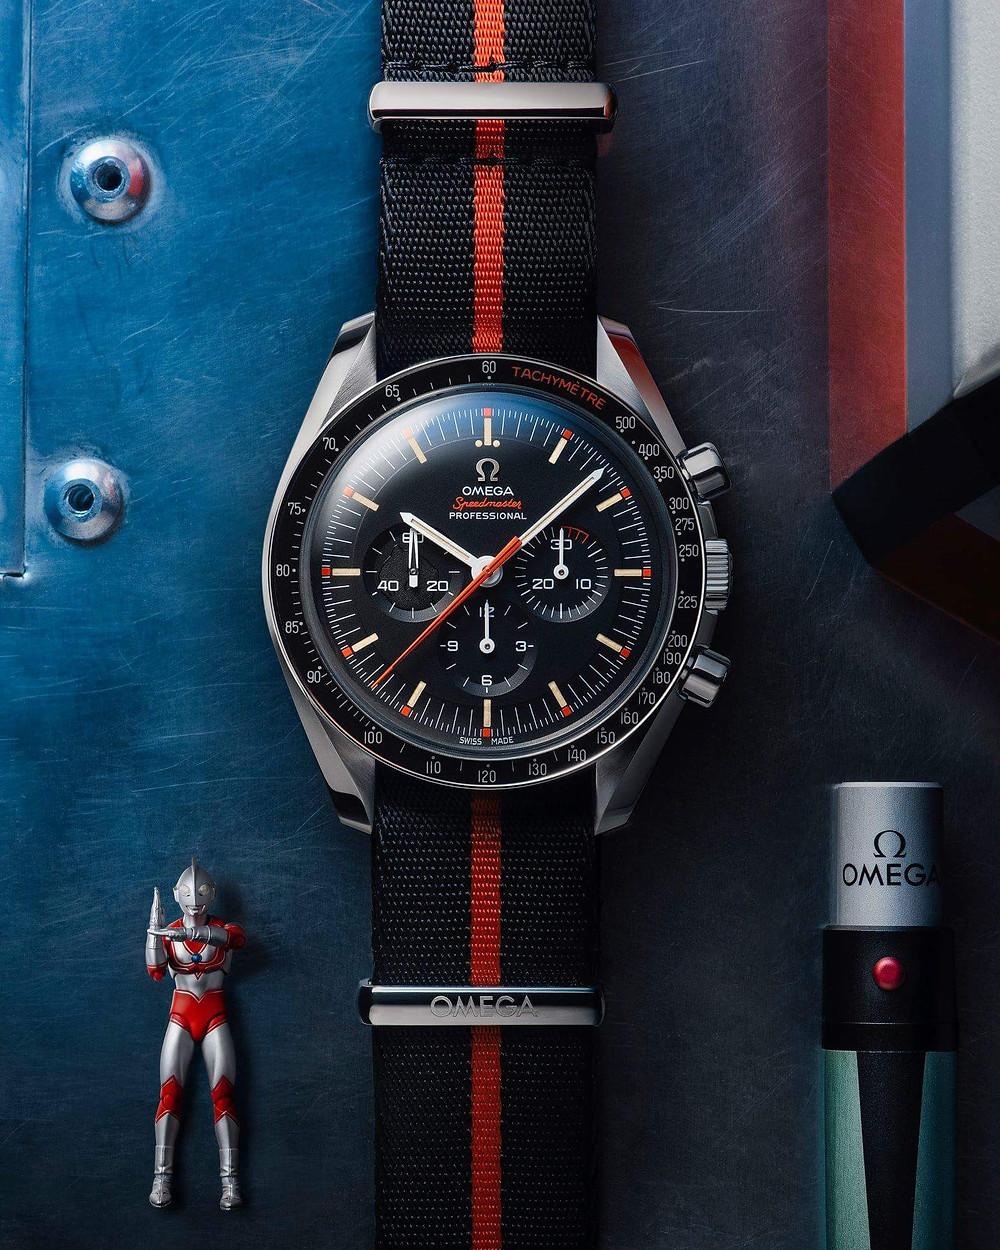 Omega Speedmaster, Ultra-Man Limited Edition timepiece